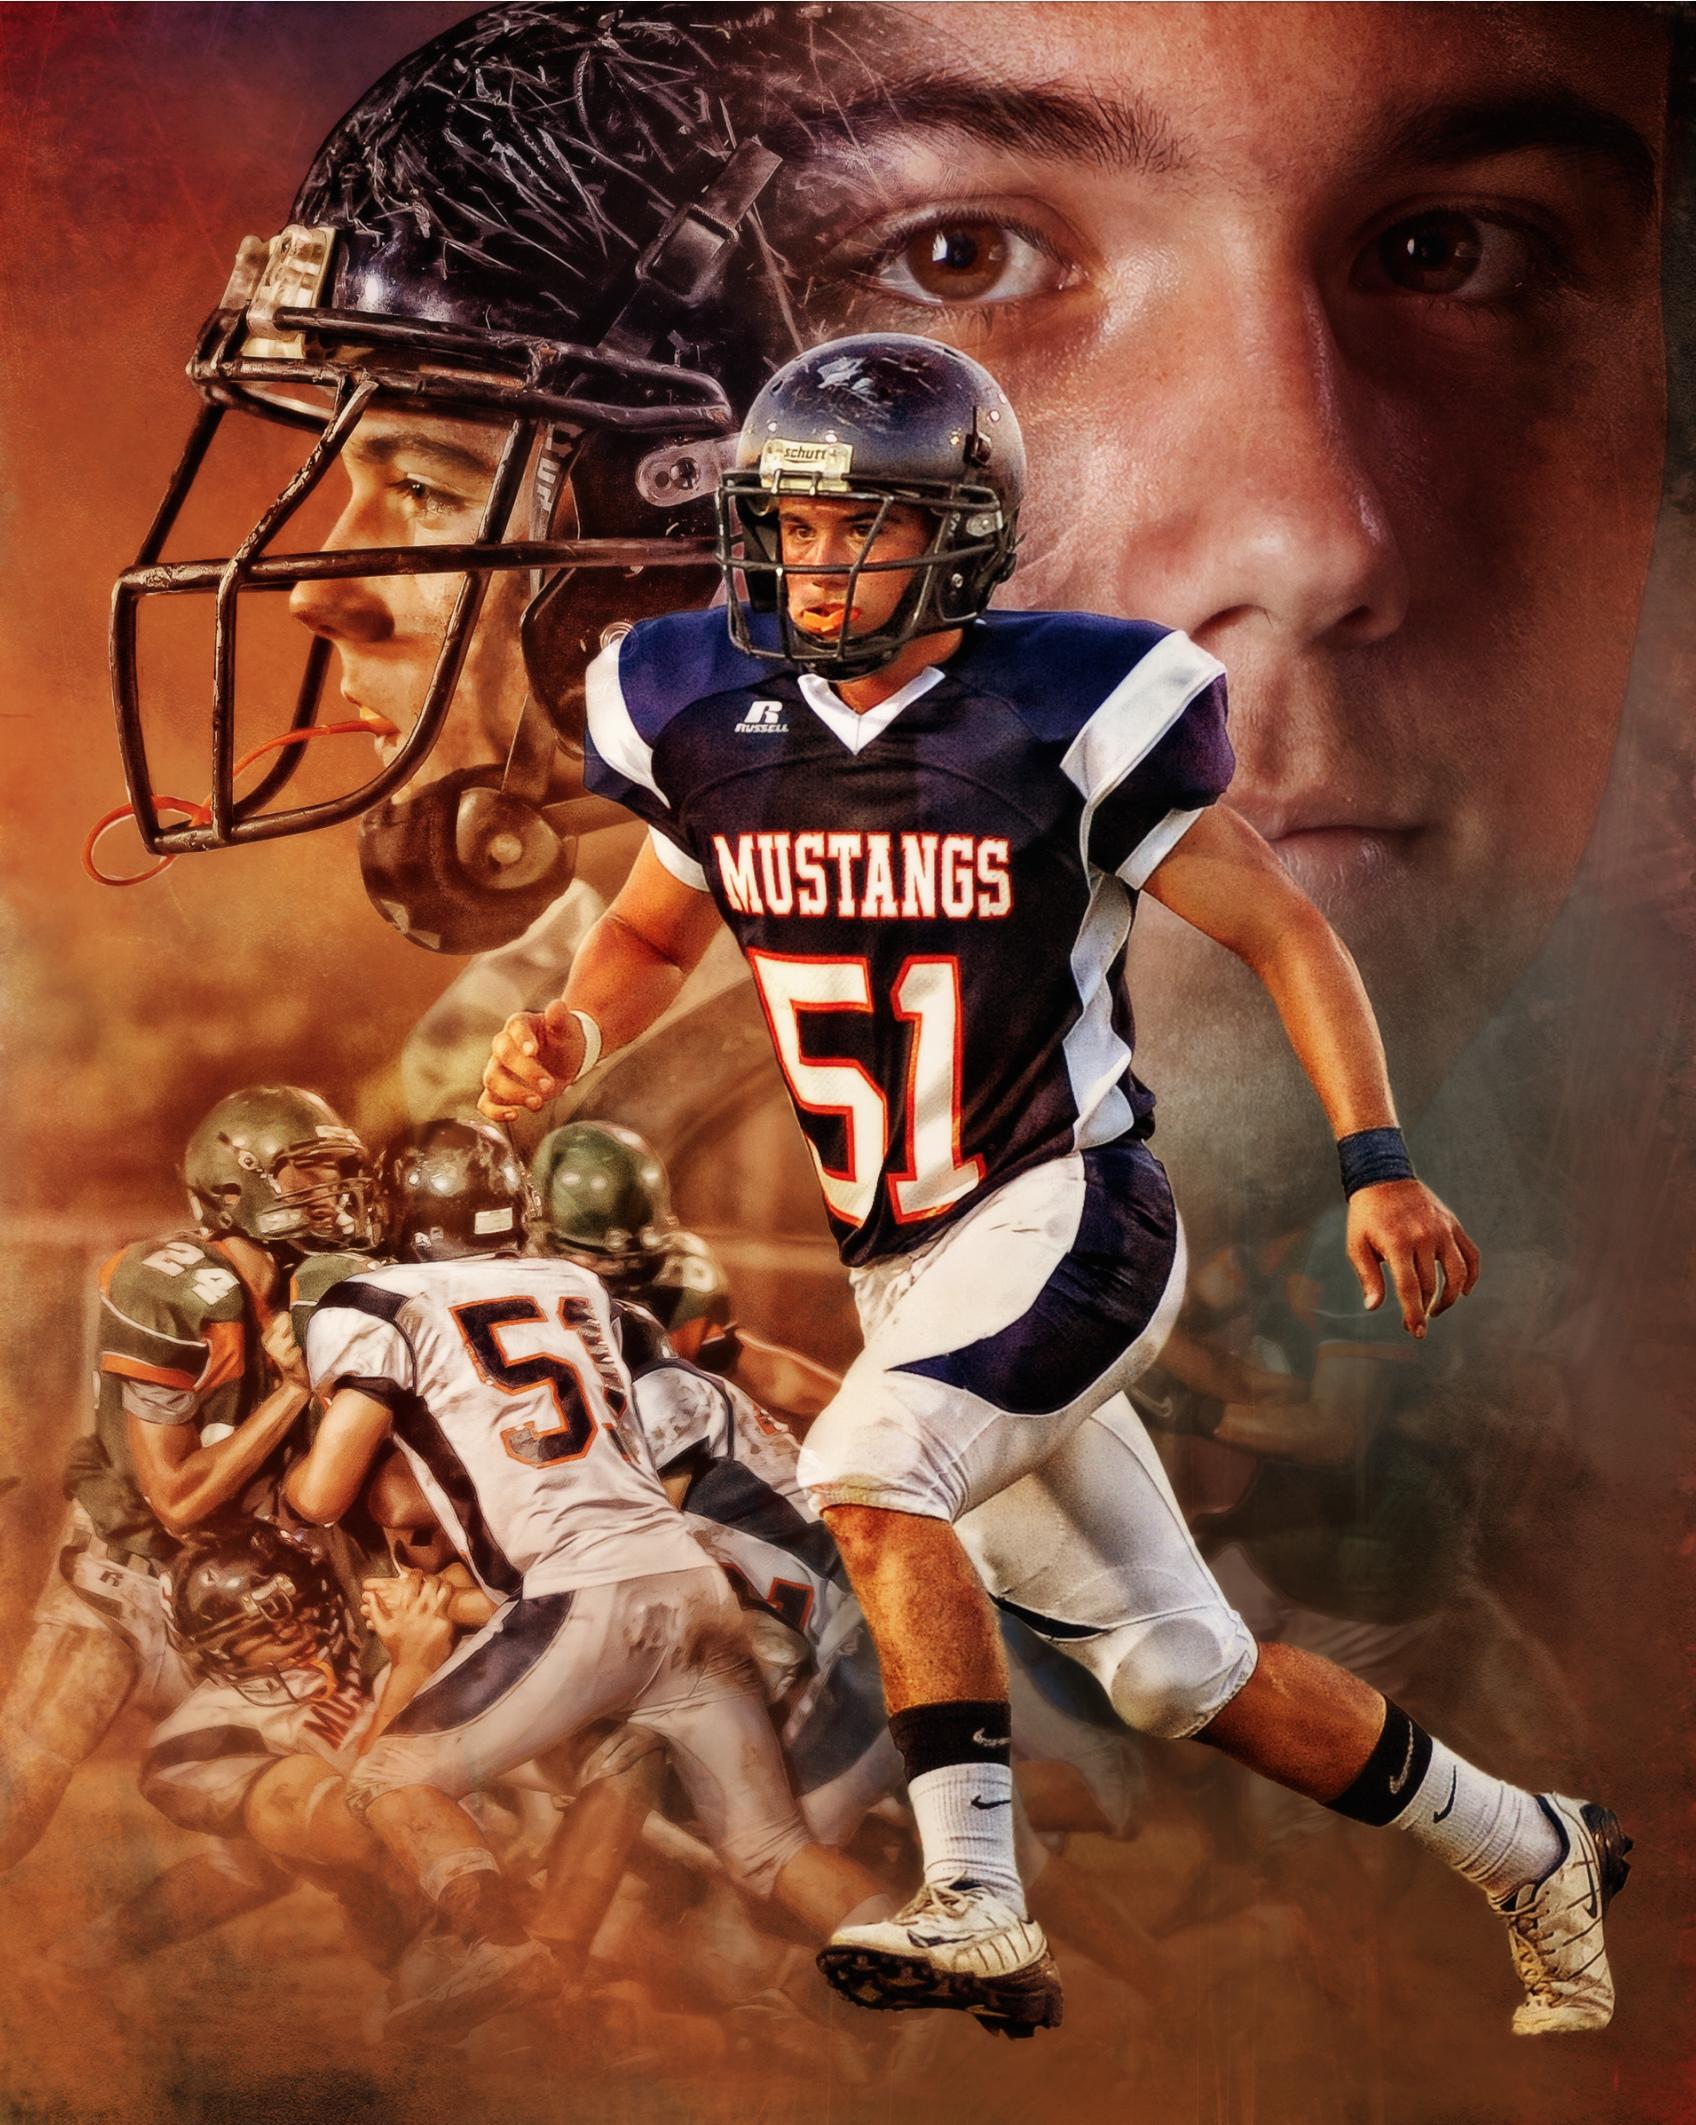 Sturdavinci art tools sports composites with photoshop tutorial sdv sports composite tutorial baditri Images